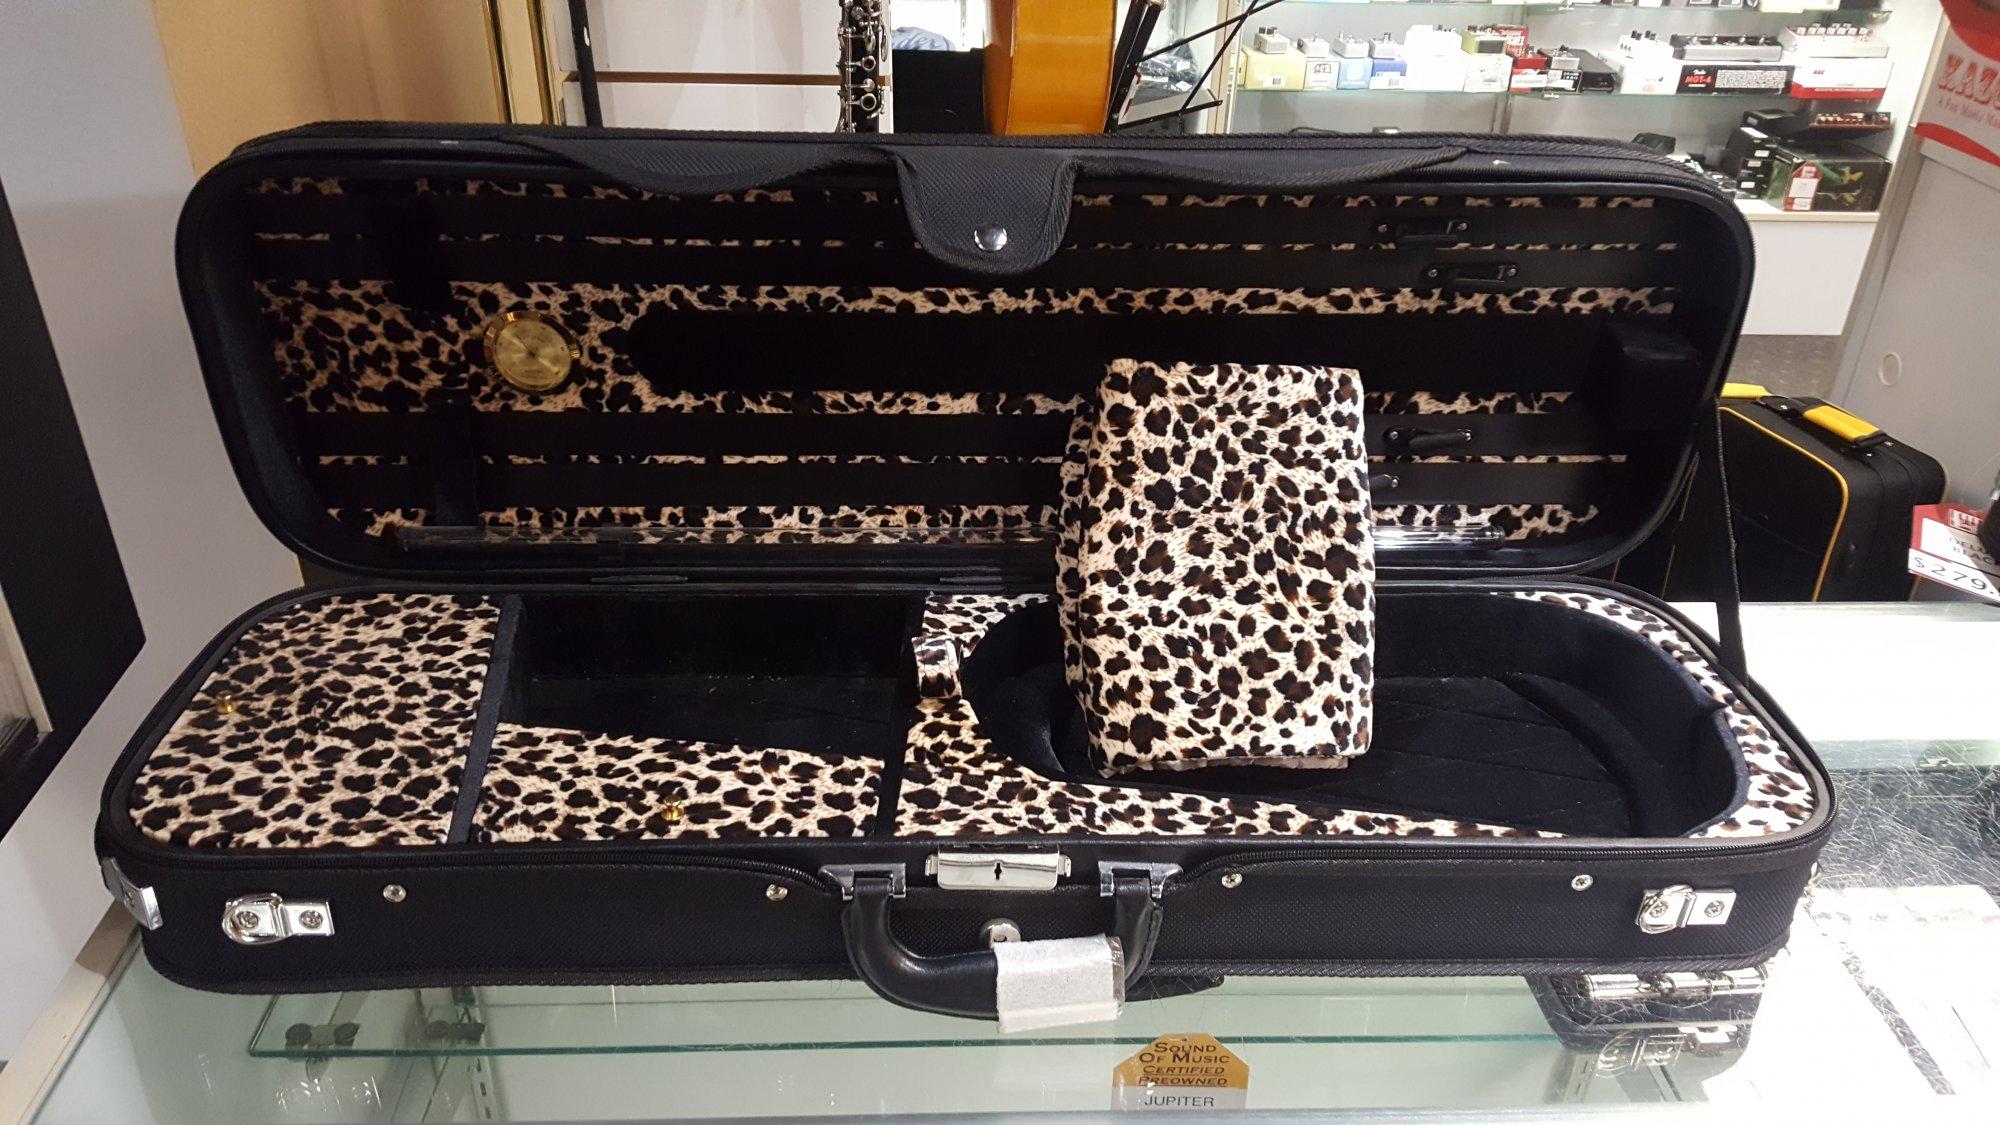 Sound of Music No. 5500 Deluxe Plywood Suspension 4/4 Violin Case - Safari Interior